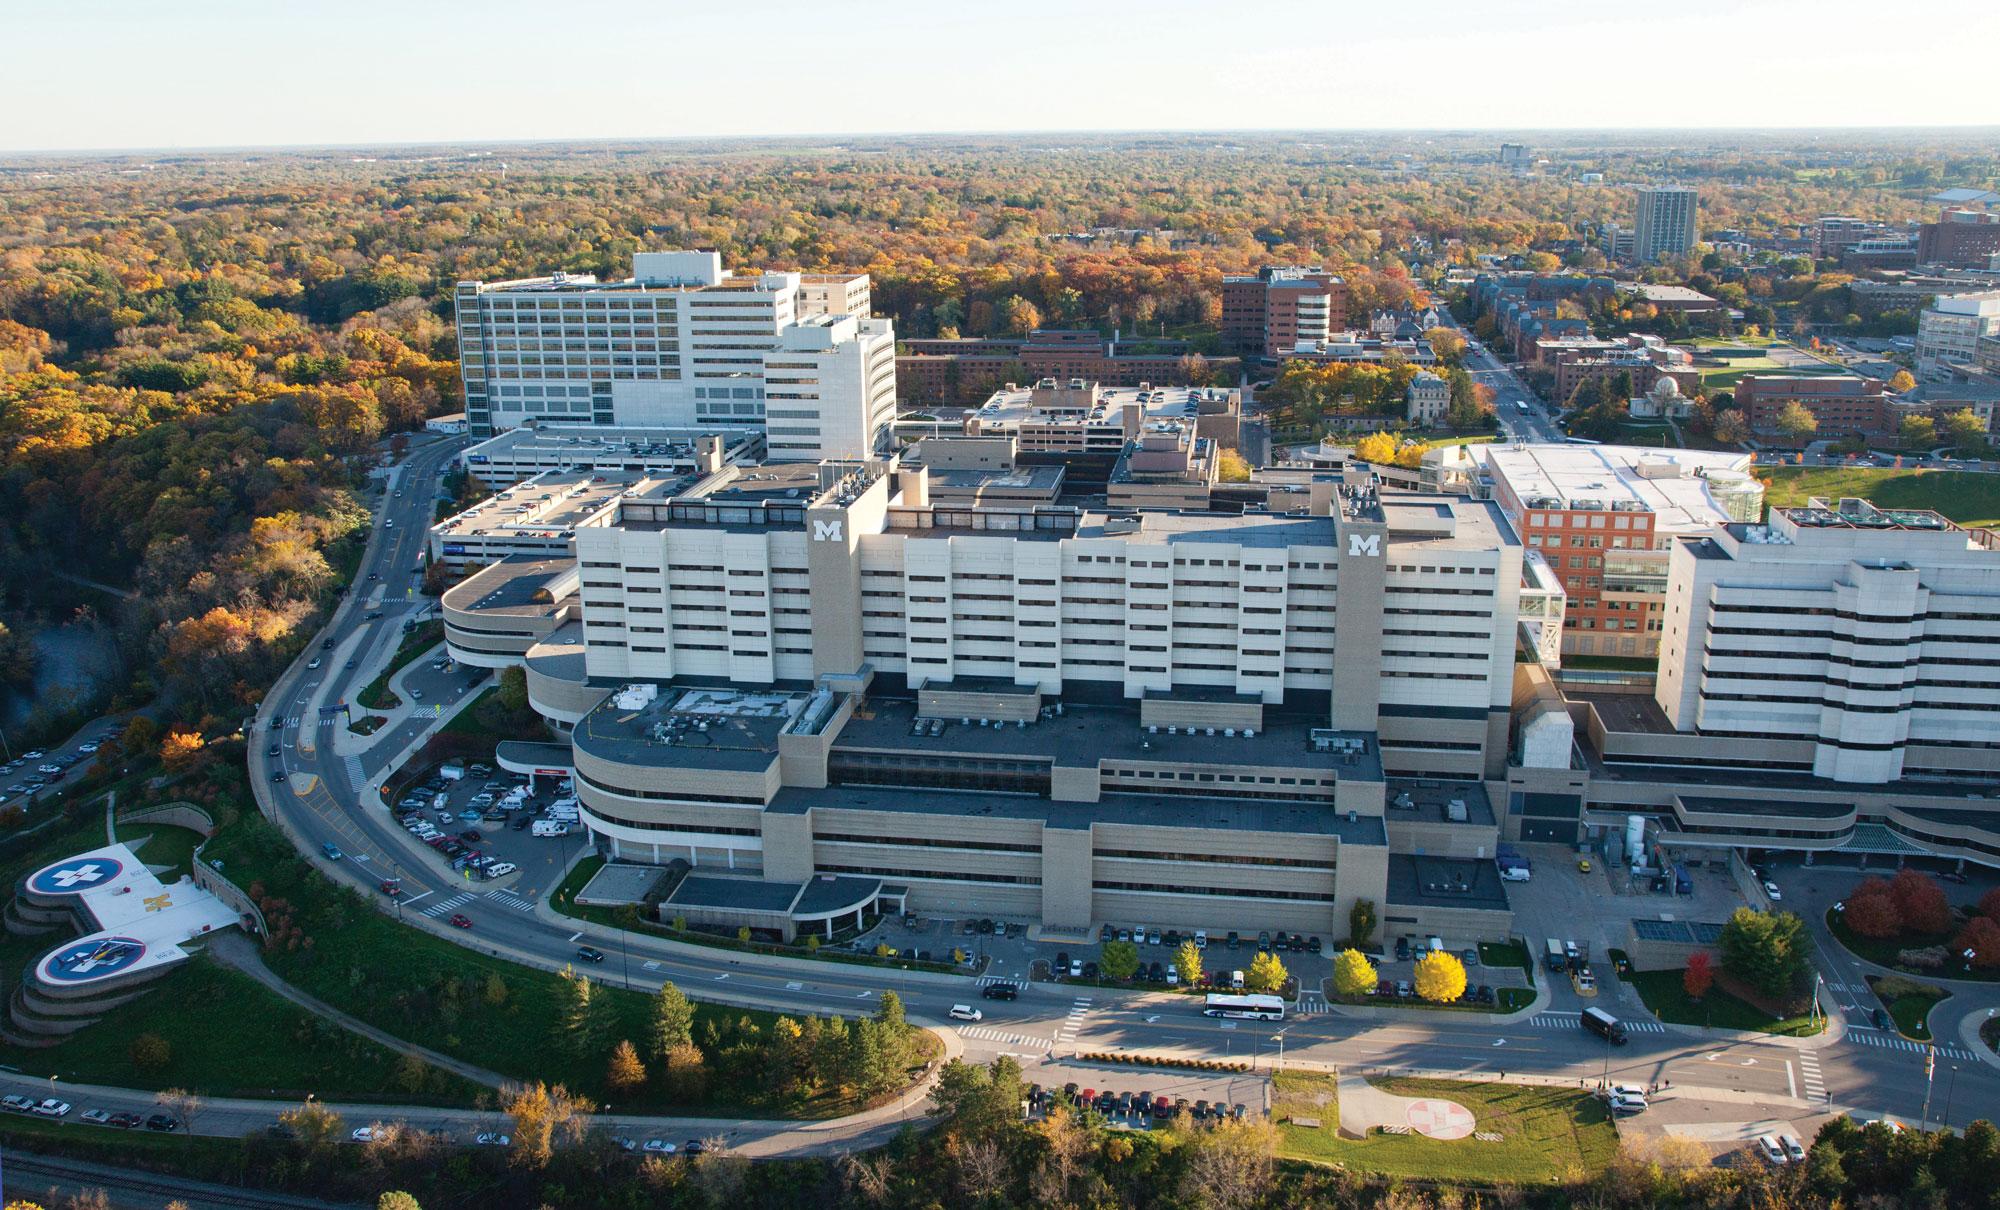 Aerial view of Michigan Medicine medical campus